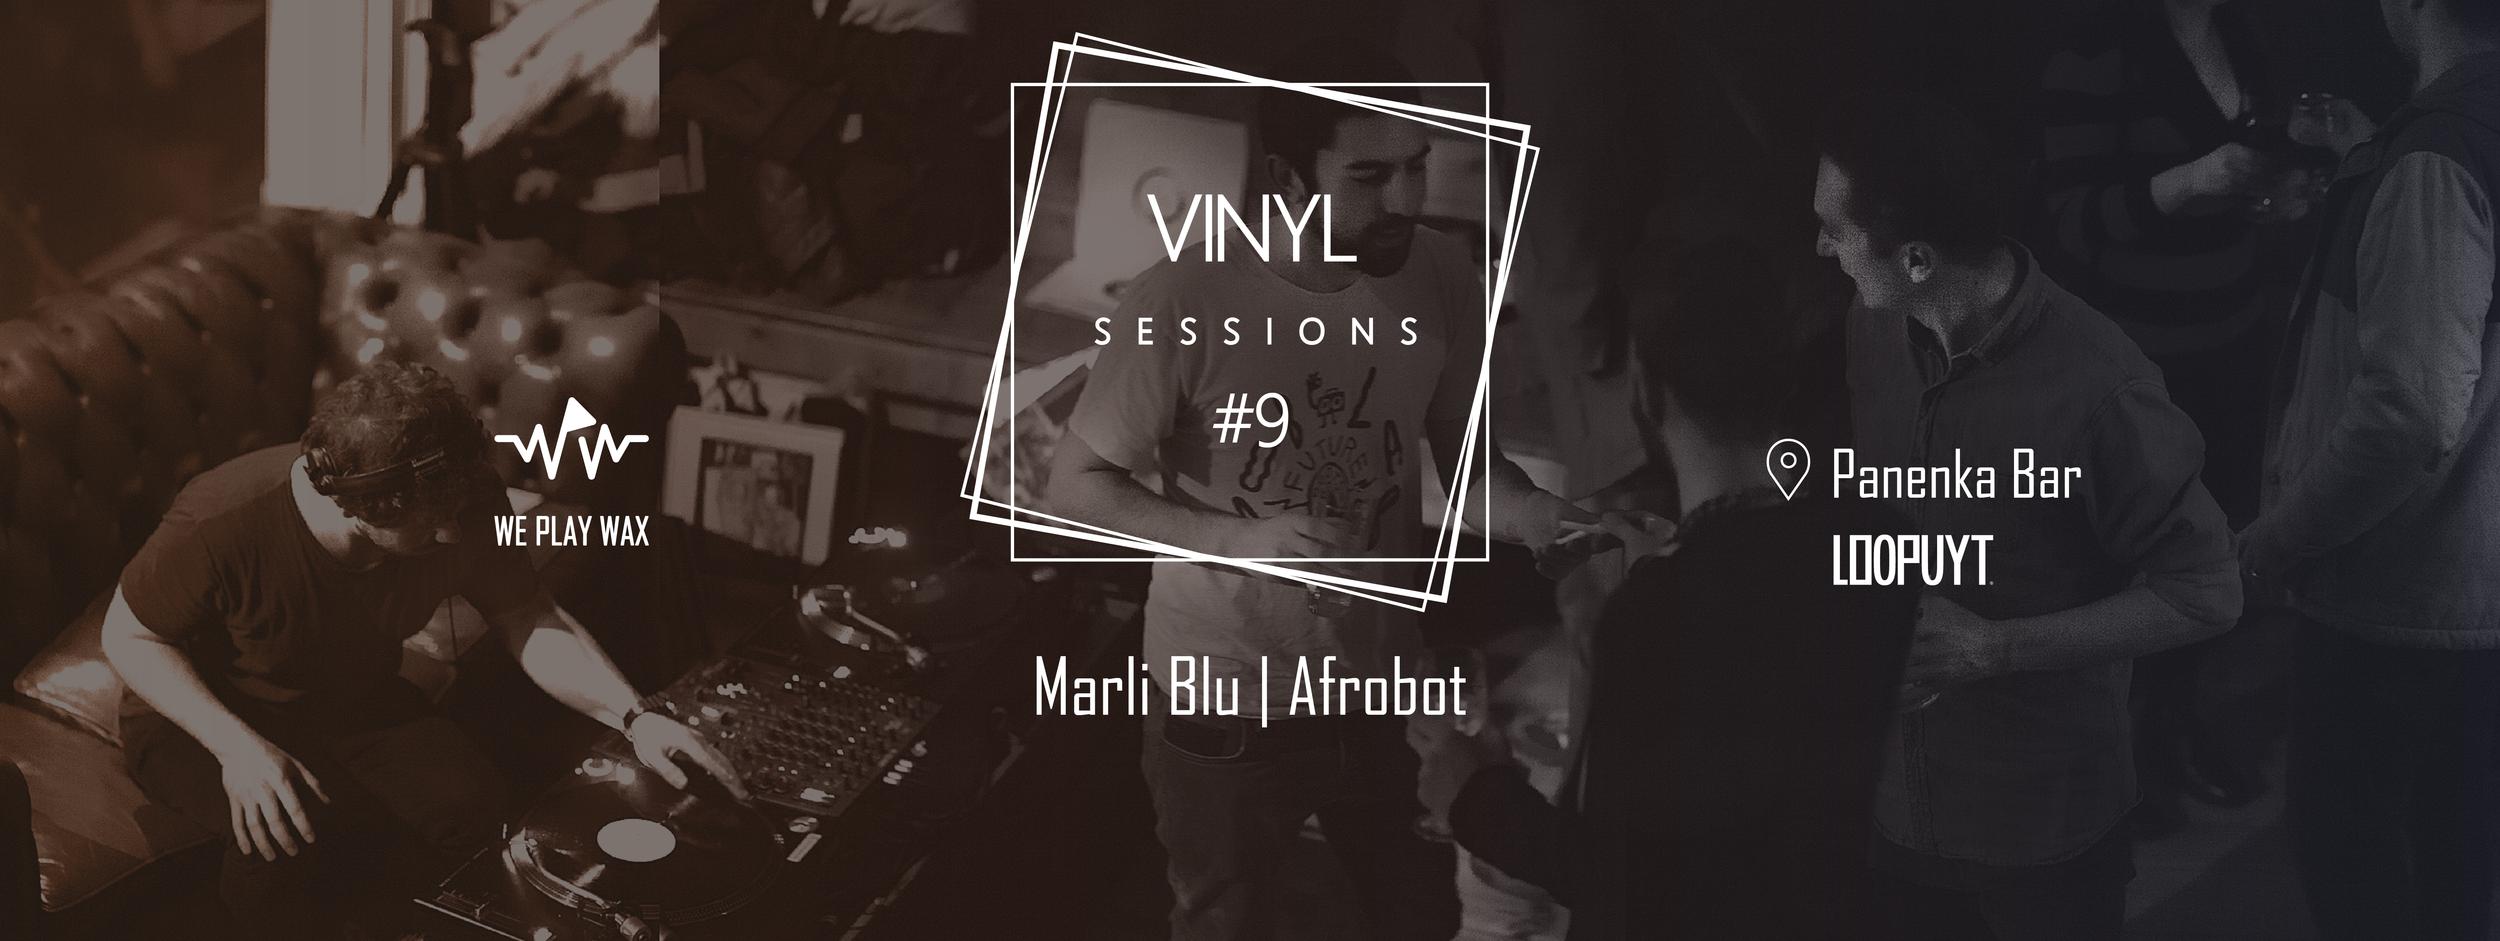 Vinyl Sessions #09 - Marli Blu and Afrobot